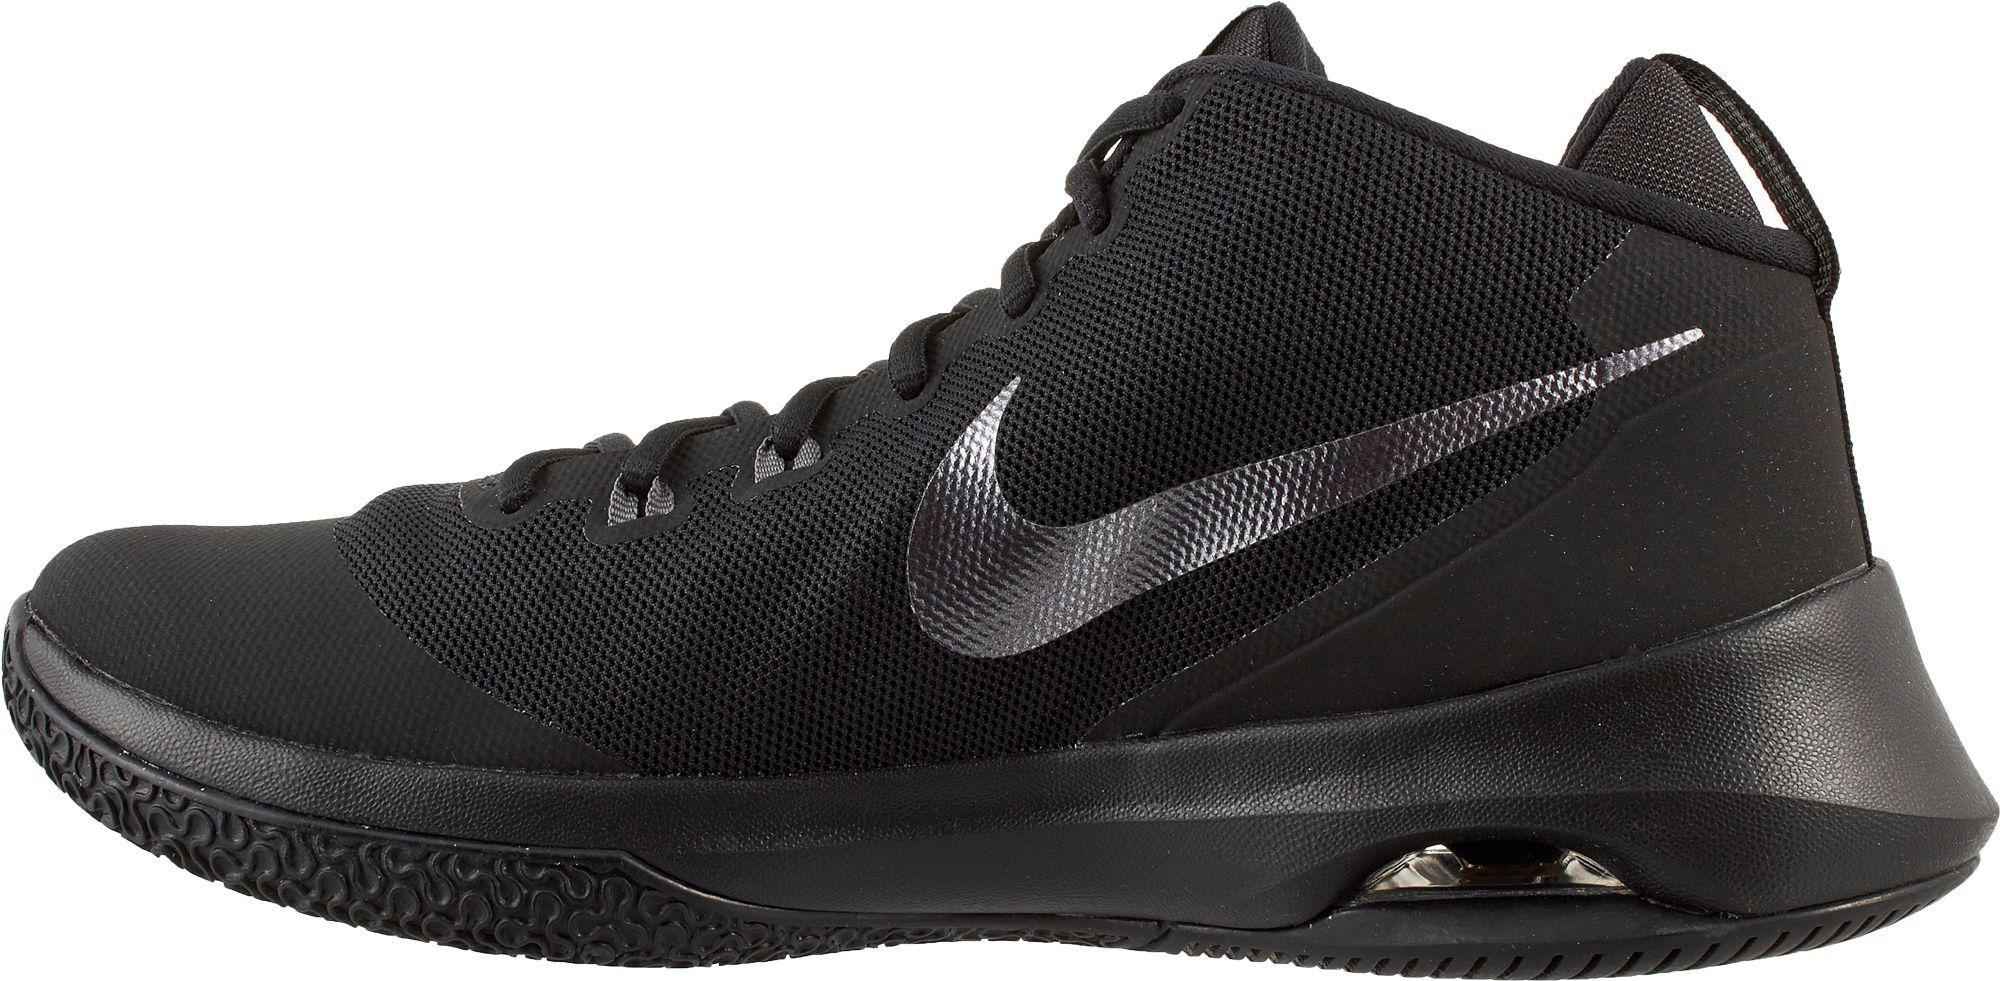 Lyst In Shoes Black Basketball For Air Nike Nubuck Versitile Men OqpXzF